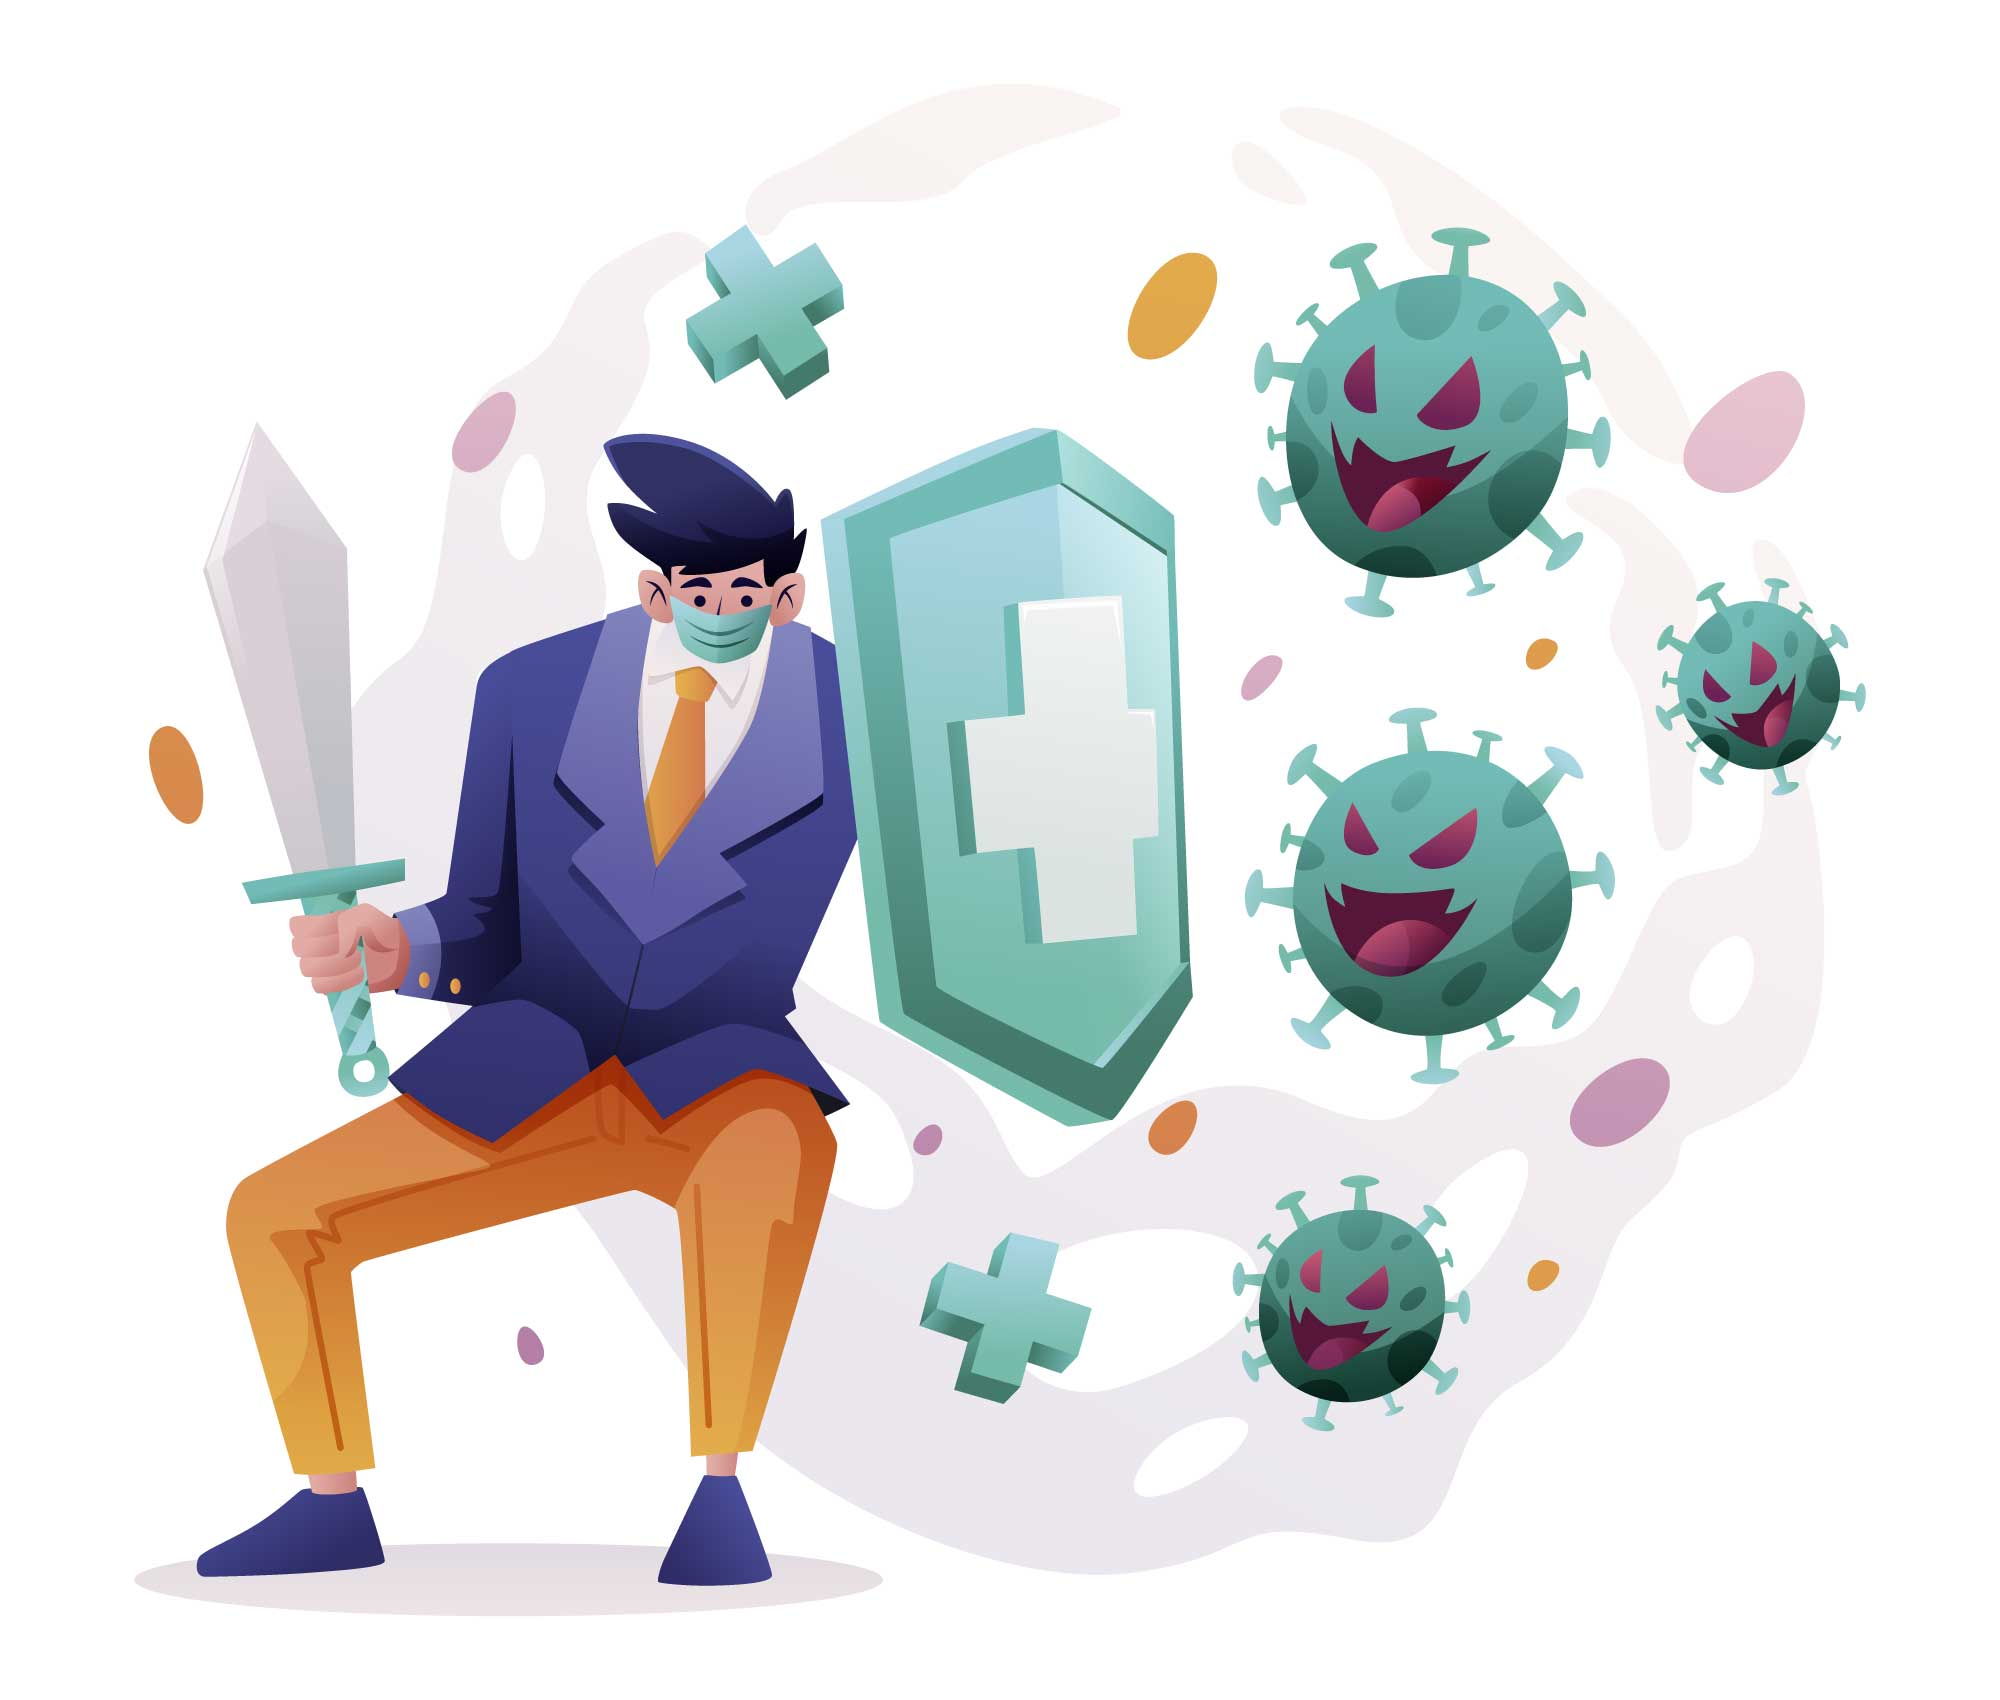 Against Corona Virus Illustration